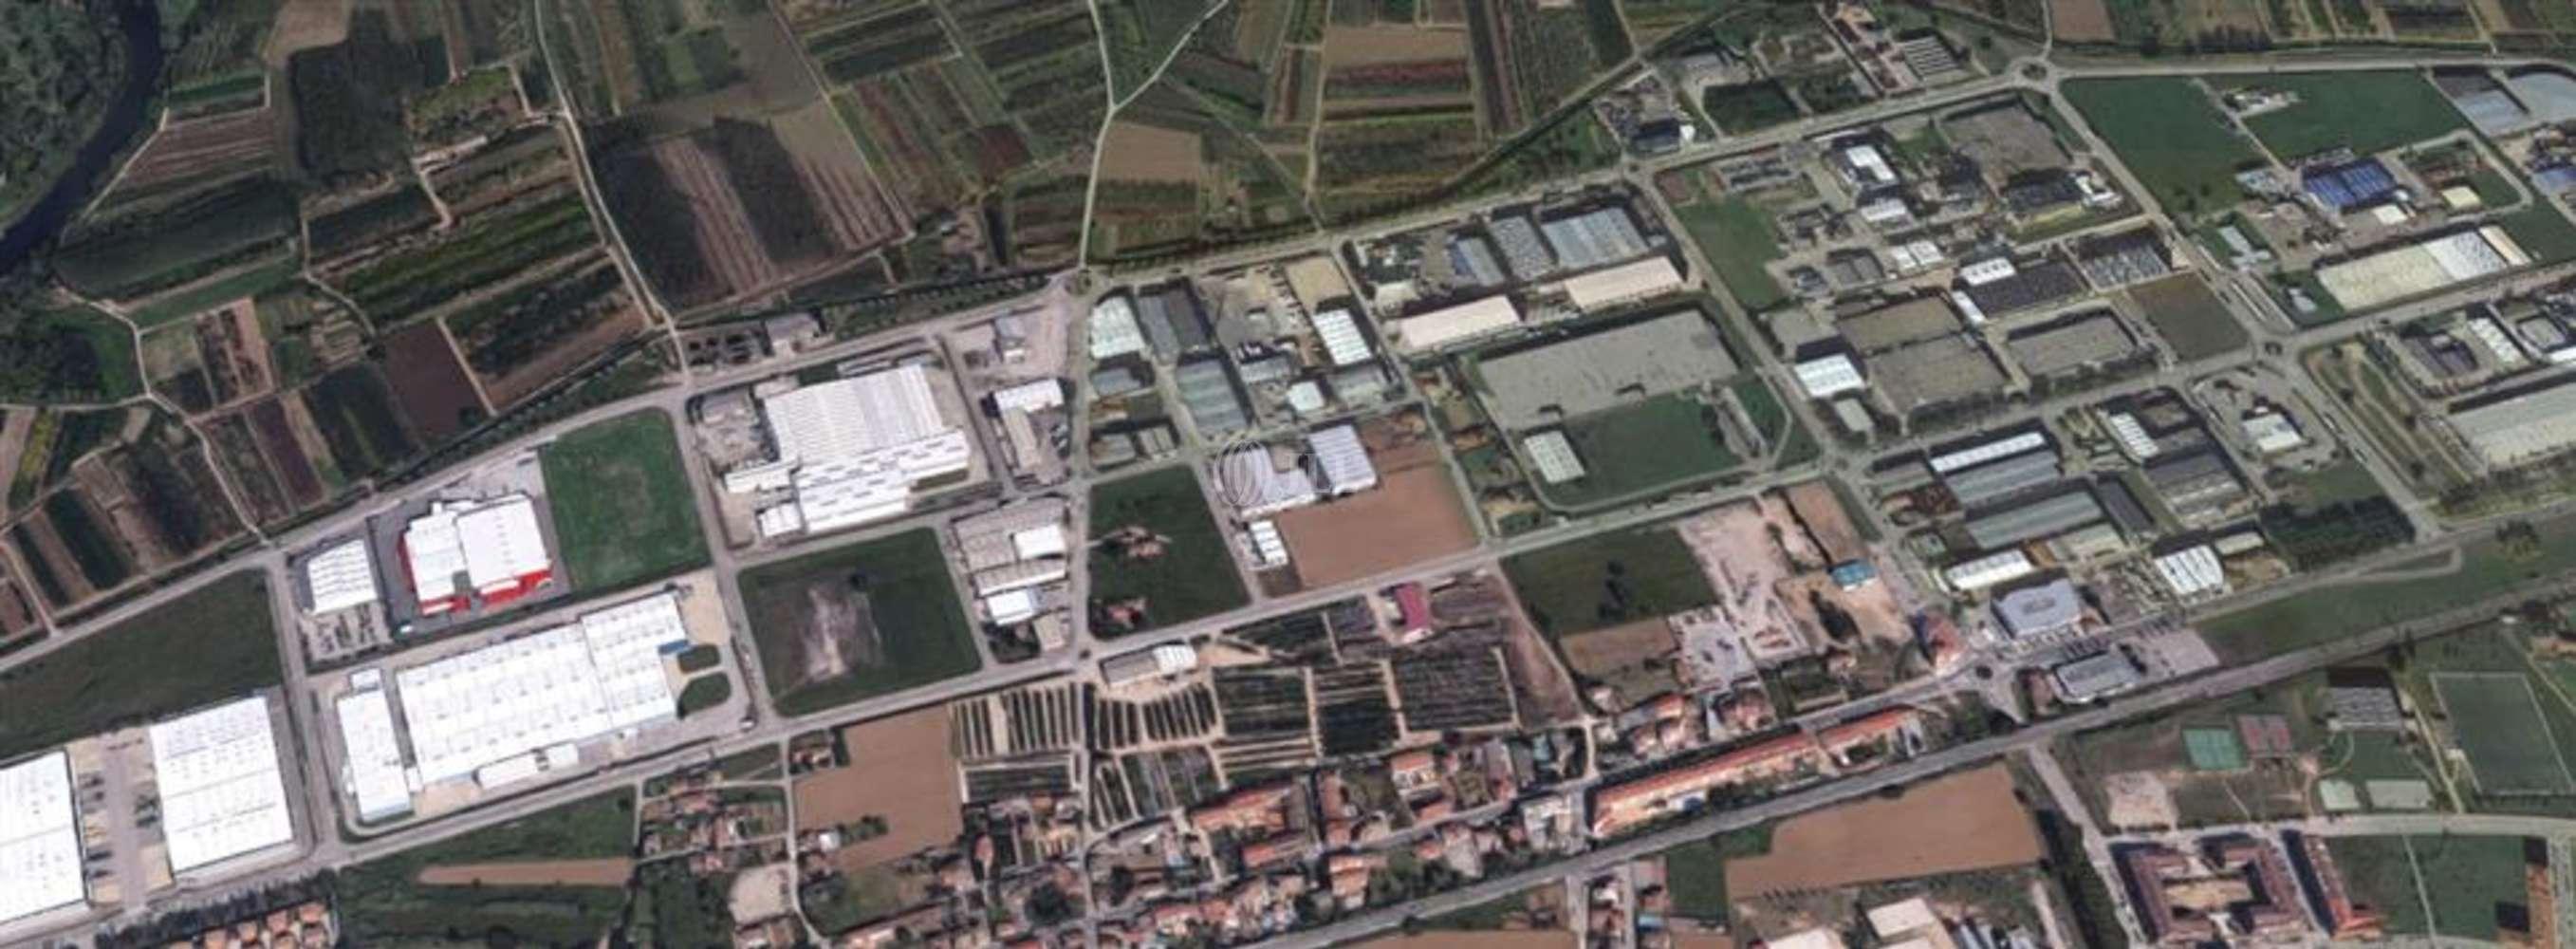 Naves industriales y logísticas Celrà, 17460 - Nave Logistica - B0401 - PI CELRÀ - 12809